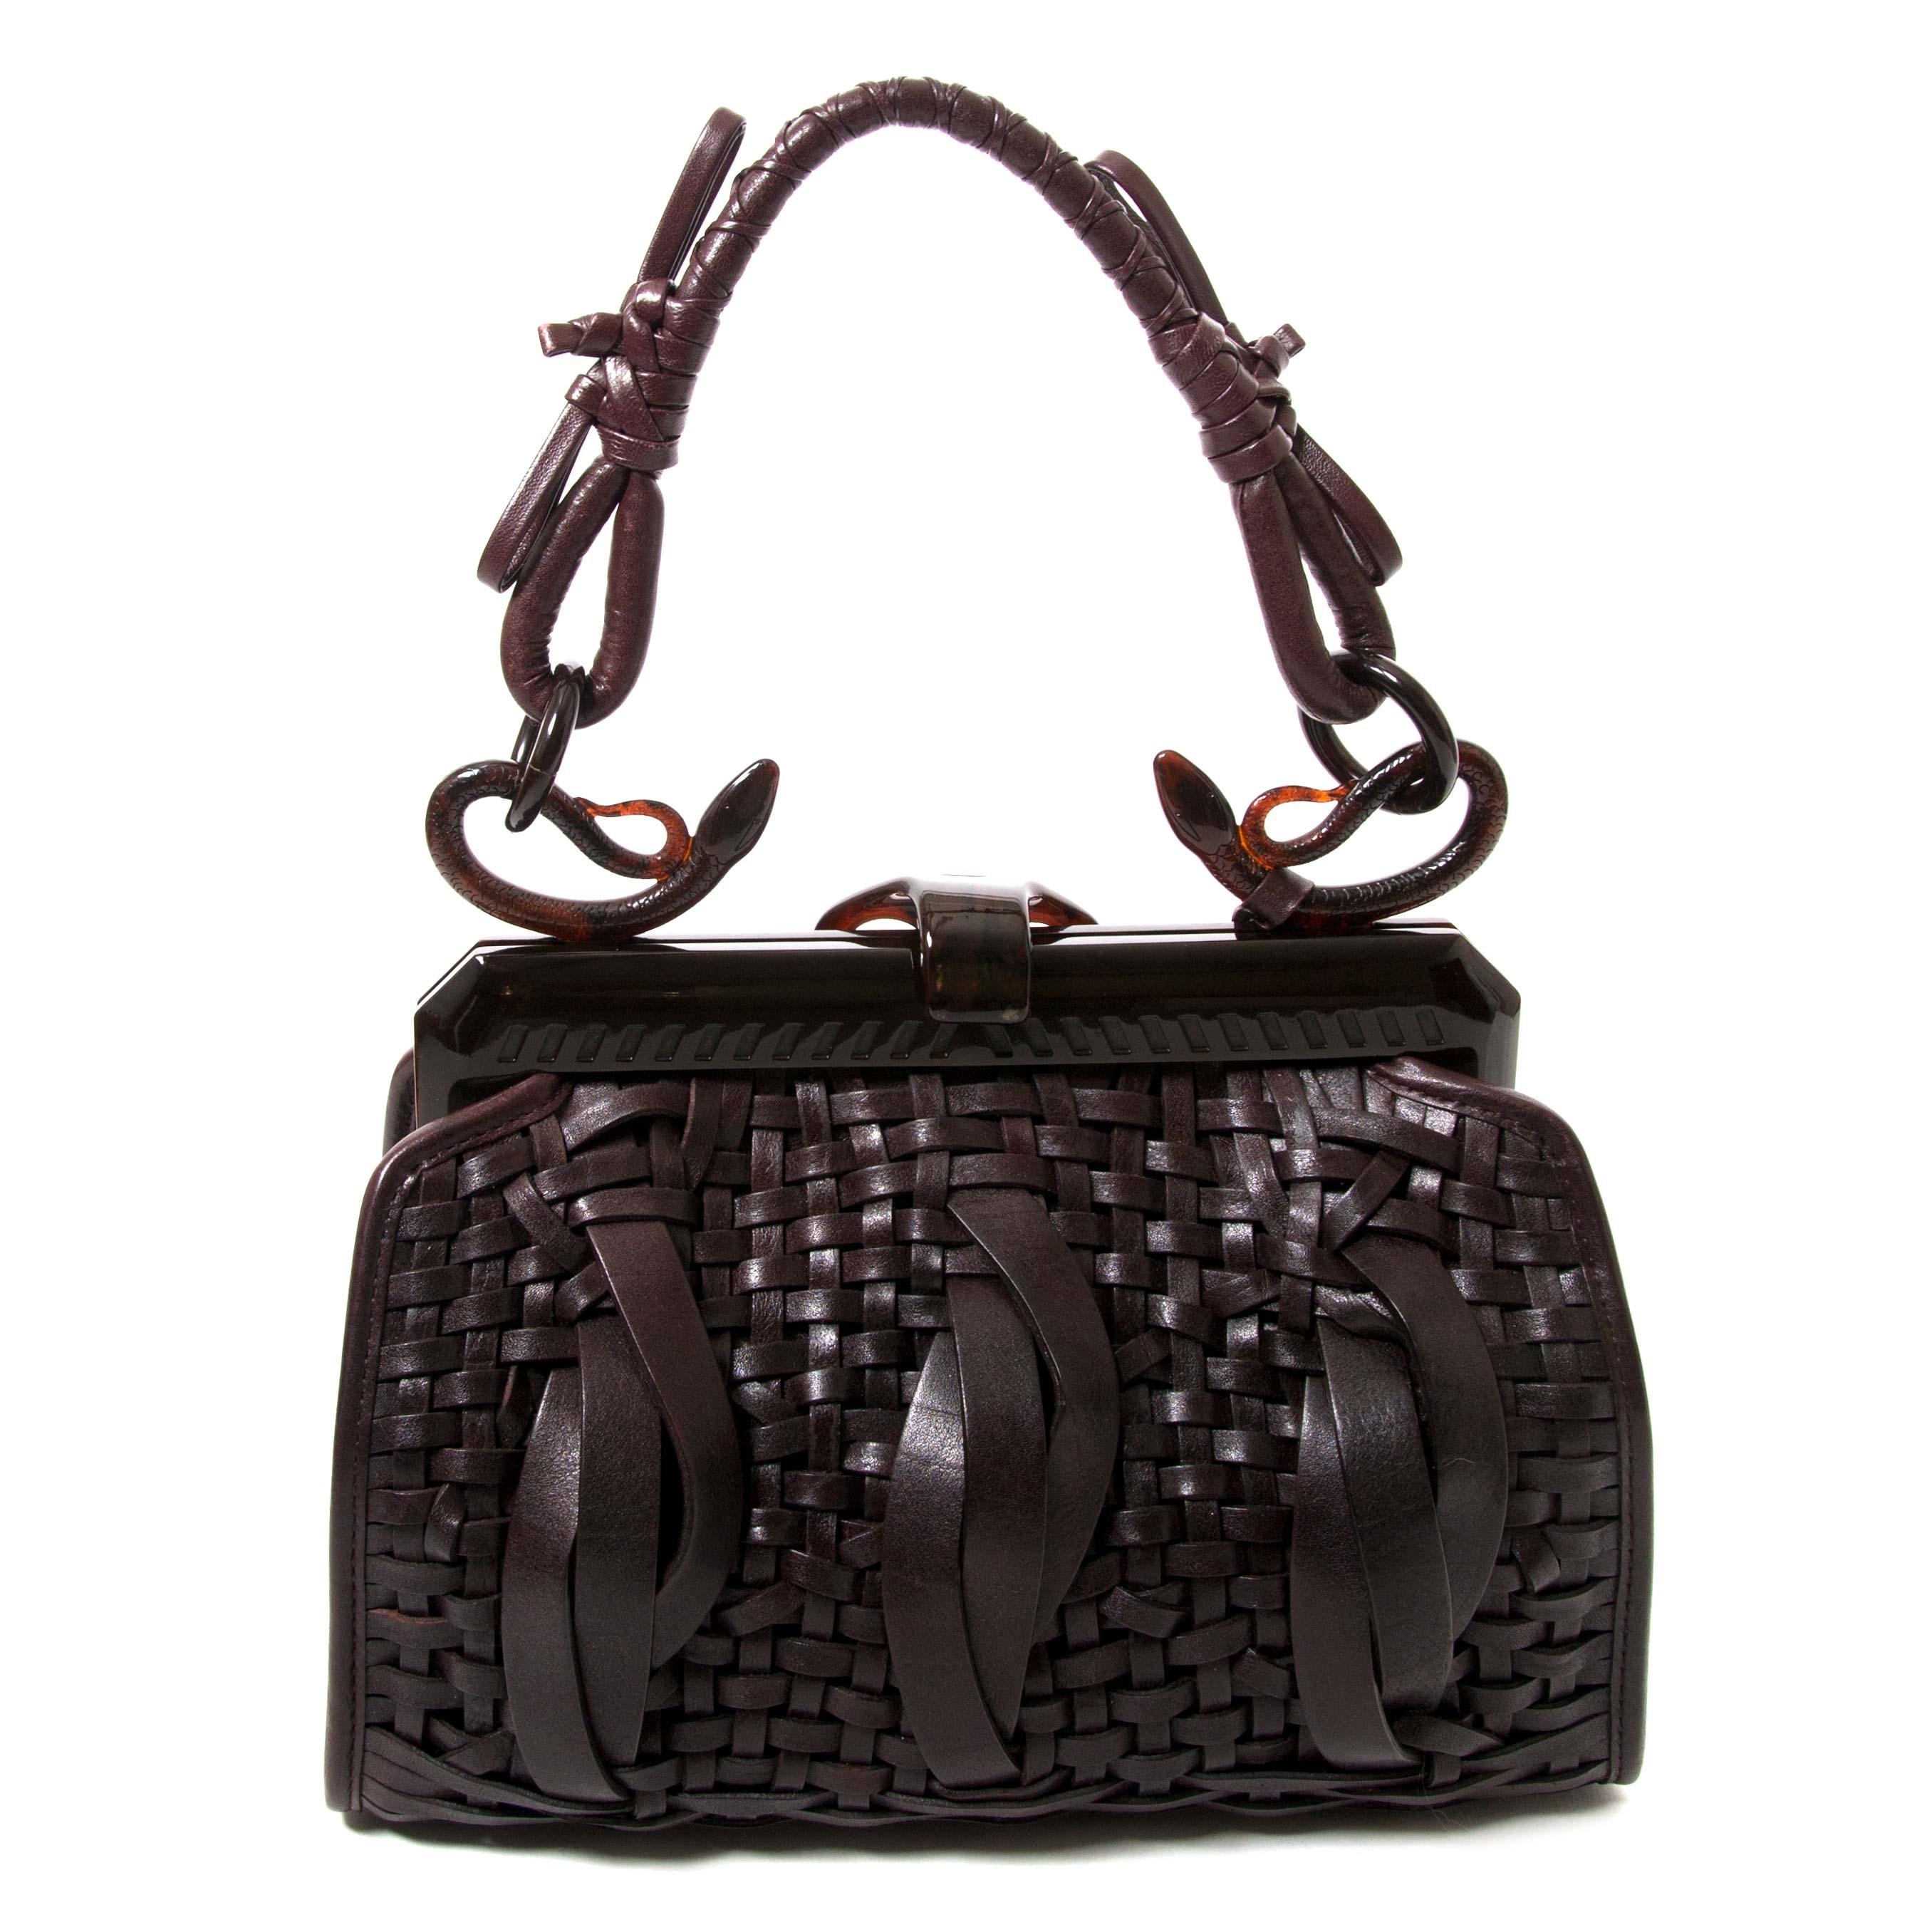 achetez Christian Dior Samourai 1947 Intrecciato Frame Bag  chez labellov pour le meileur prix